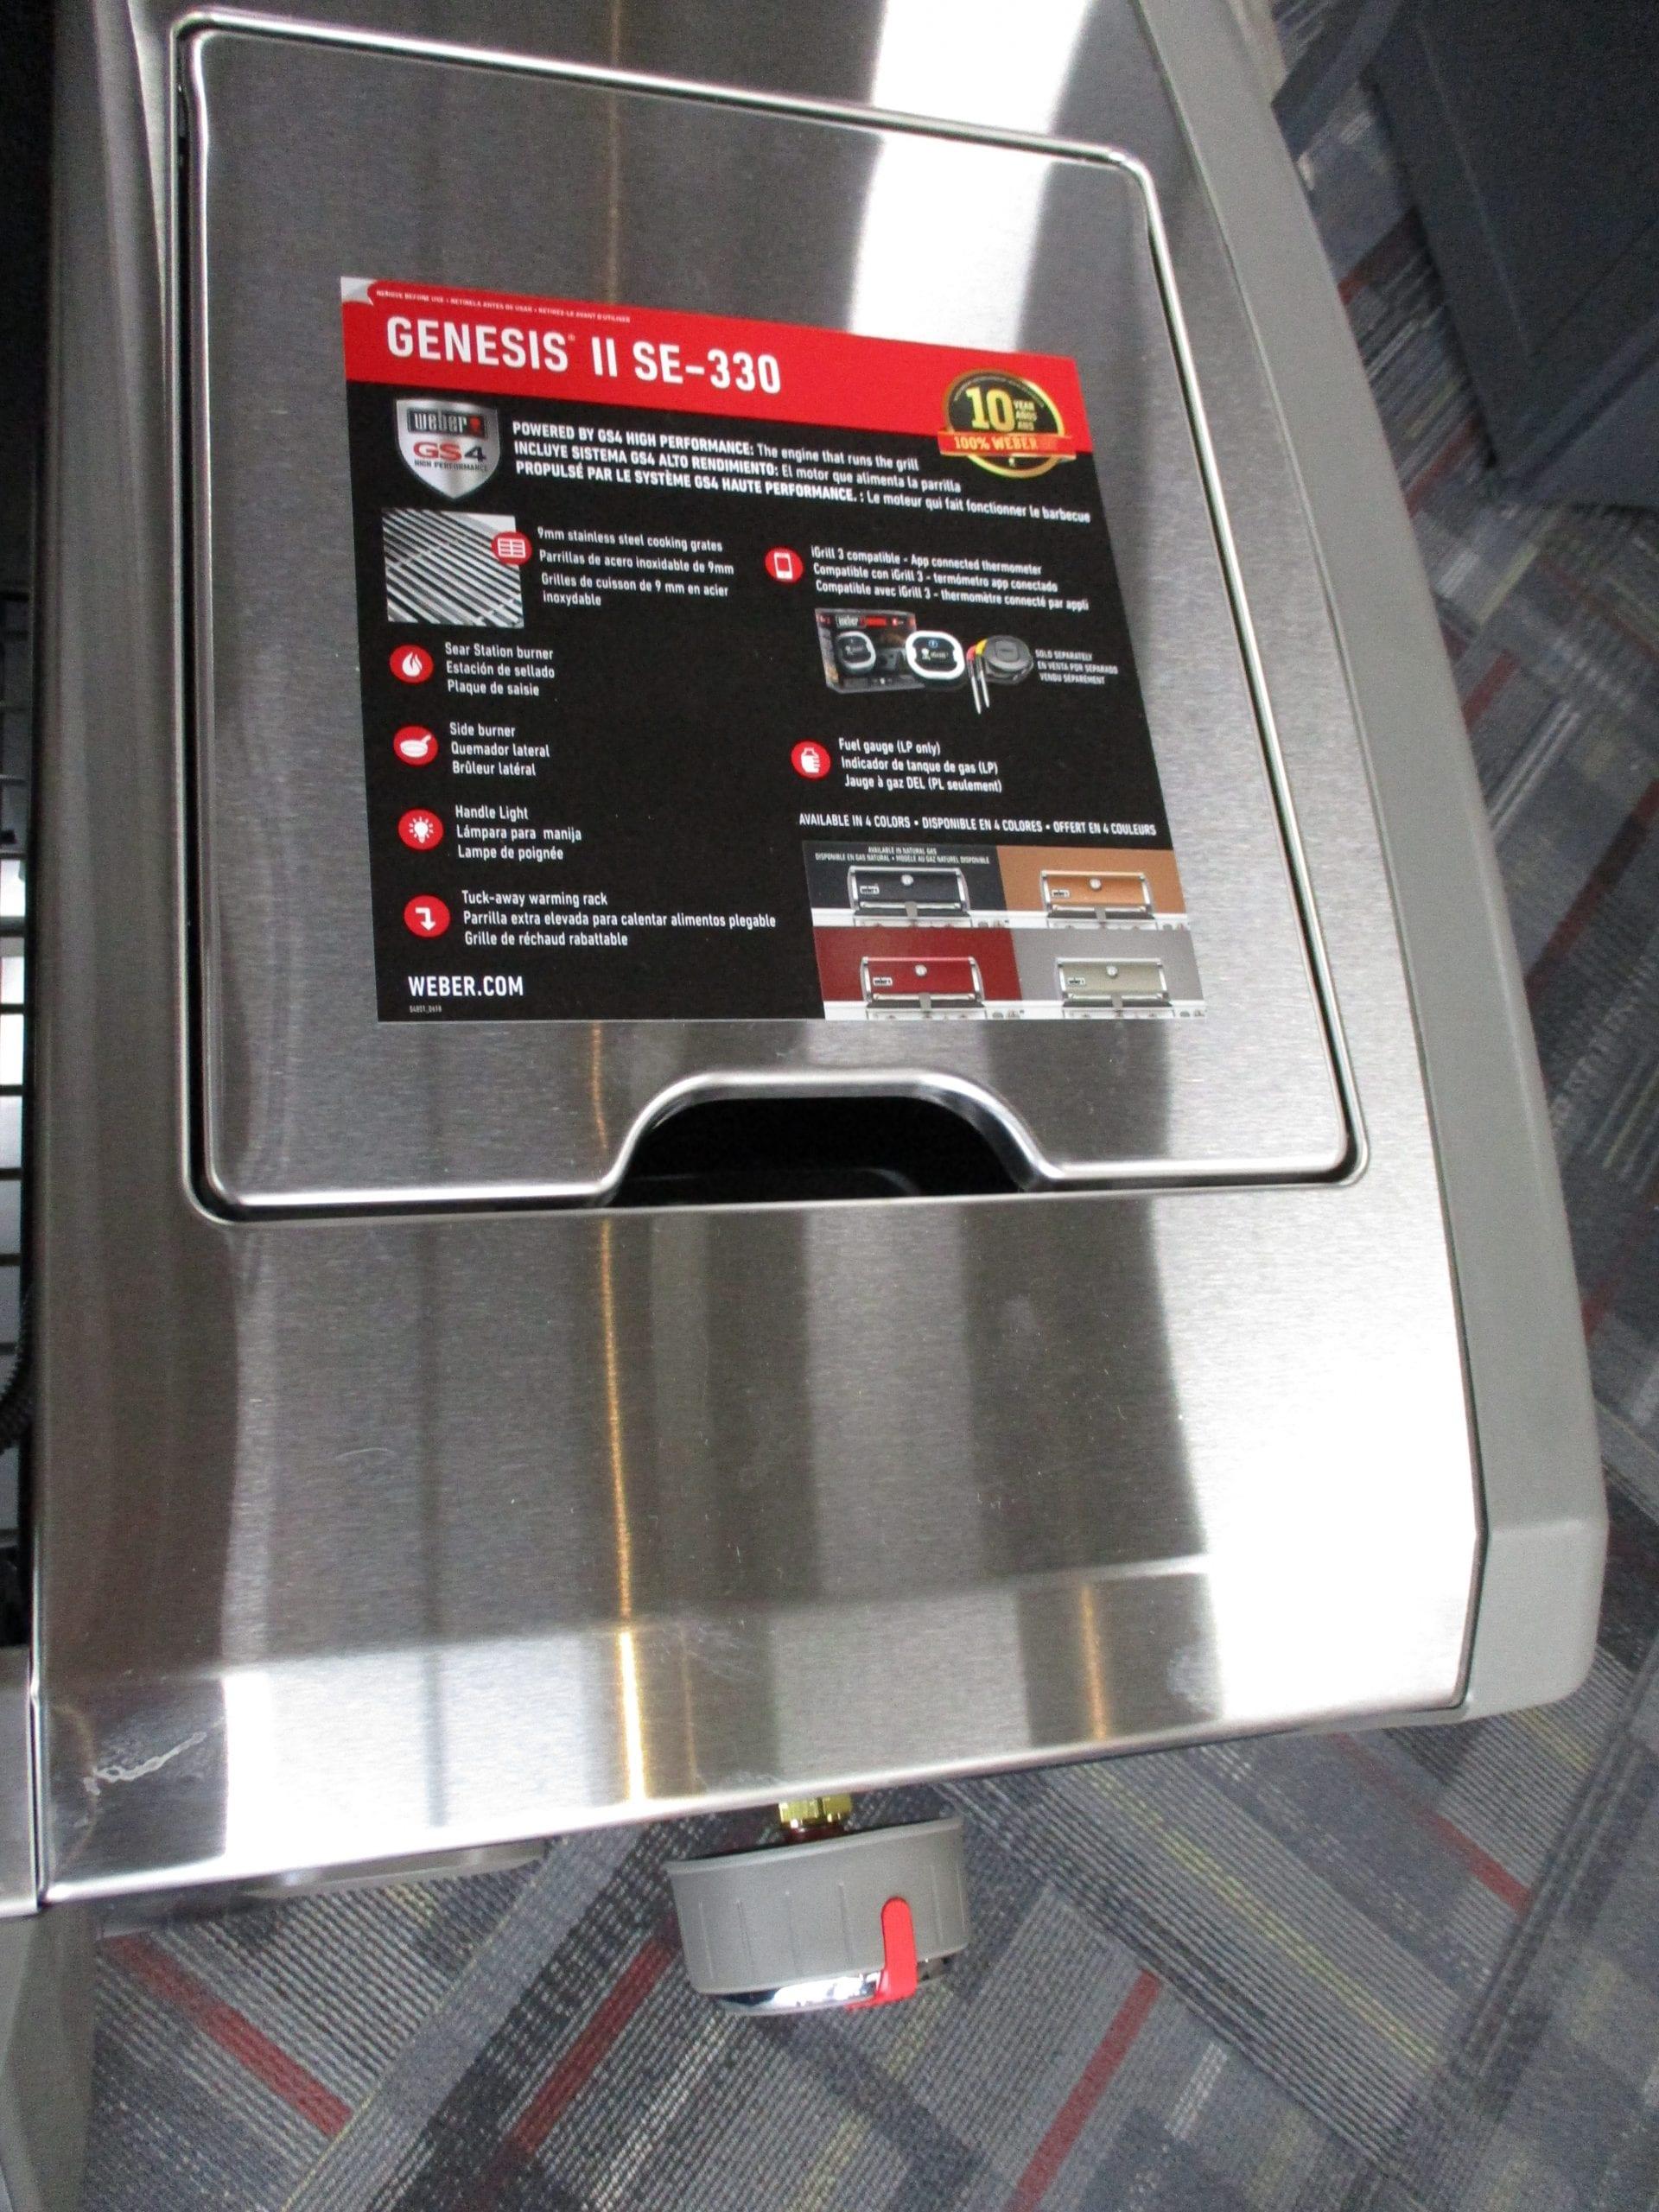 Genesis SE330 Grill details